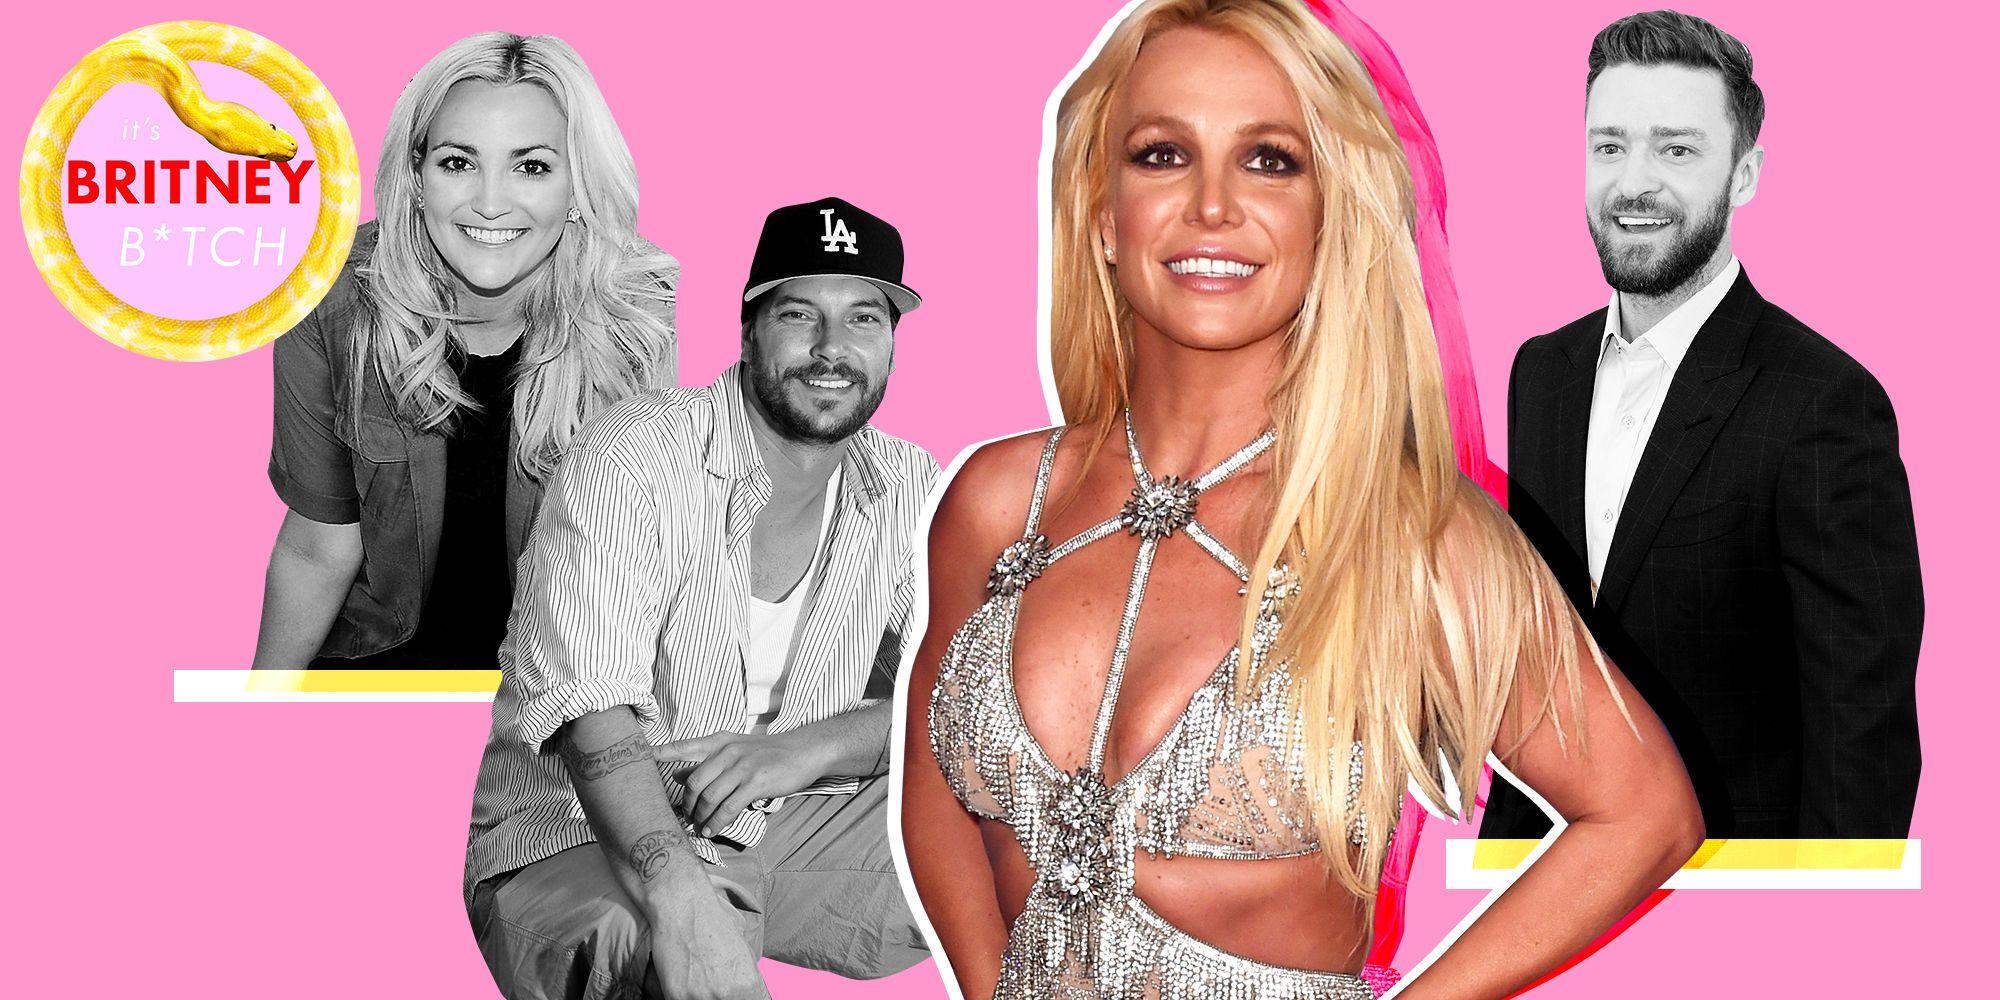 Britney fed free k sex spear video